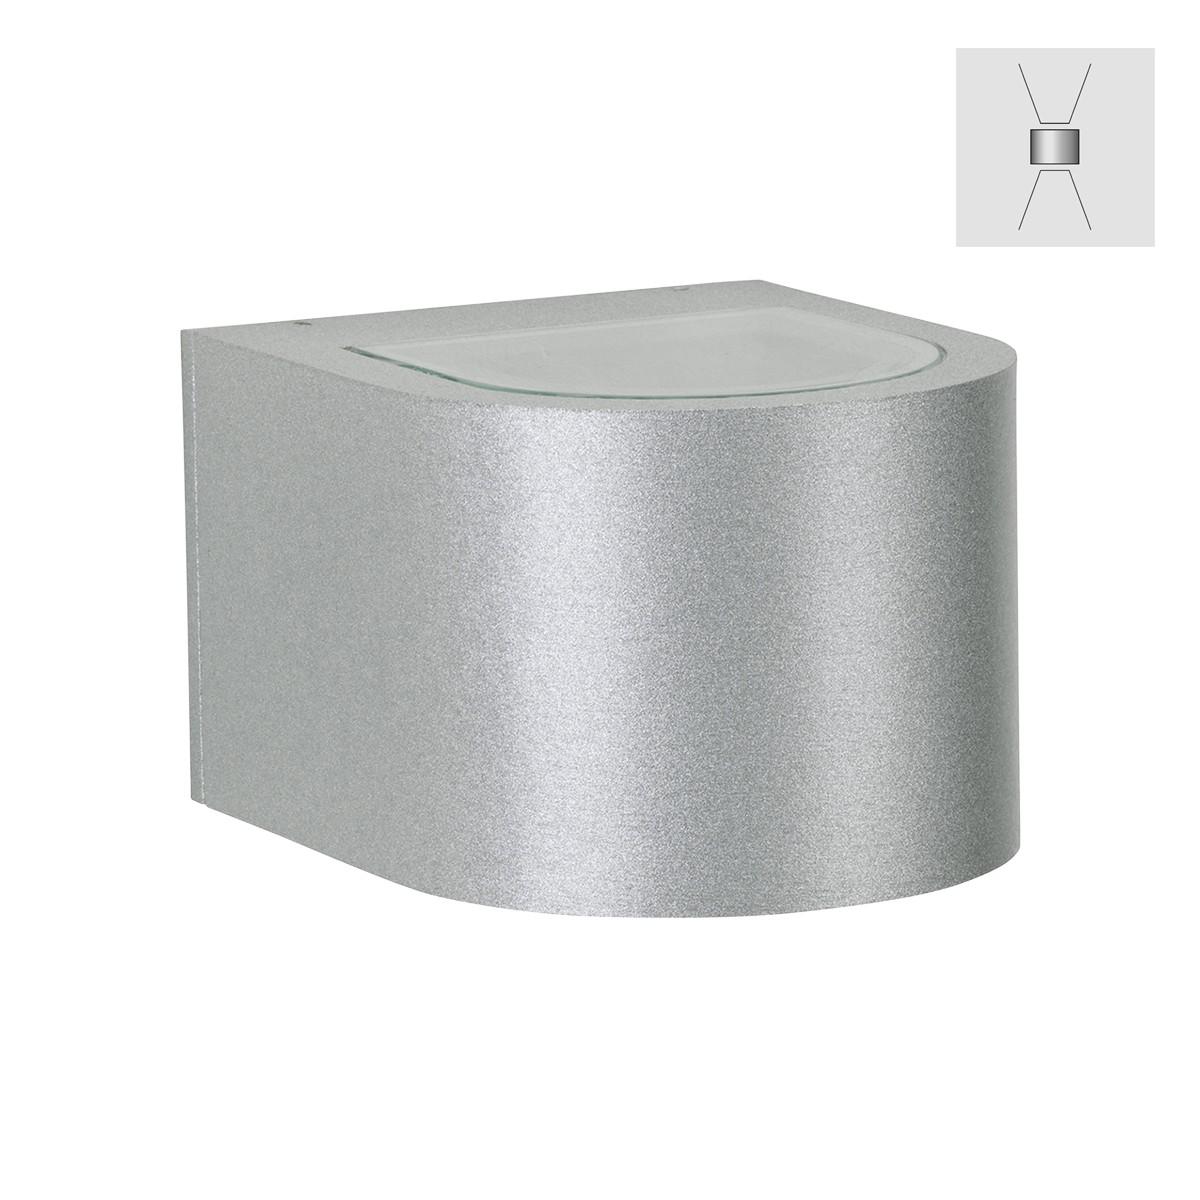 Albert 2340 Wandstrahler, breit/breit, Silber